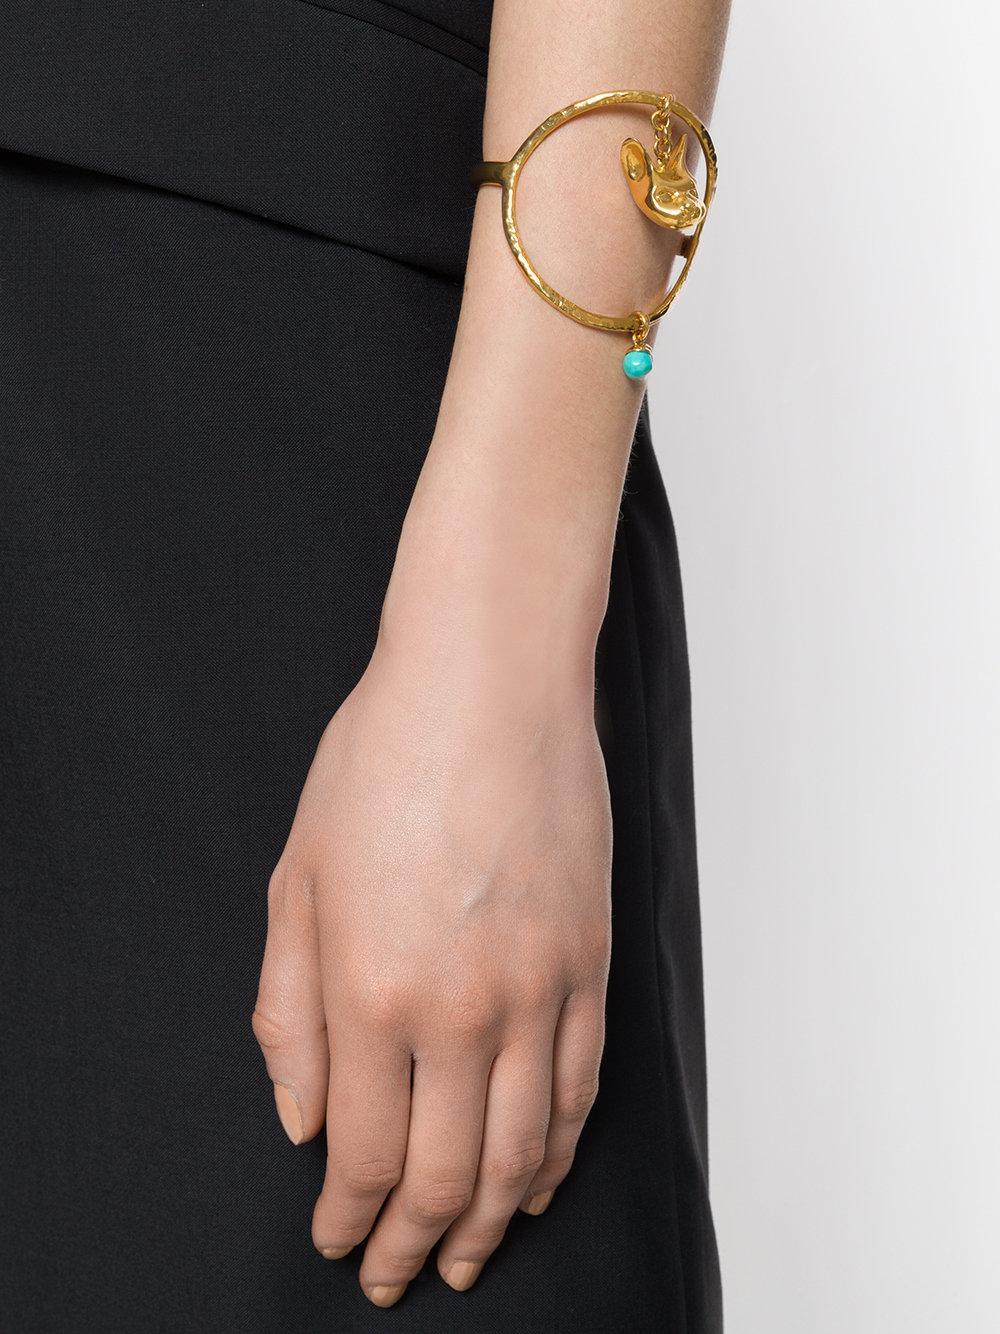 Givenchy cat charm bracelet - Metallic LjuqkQu